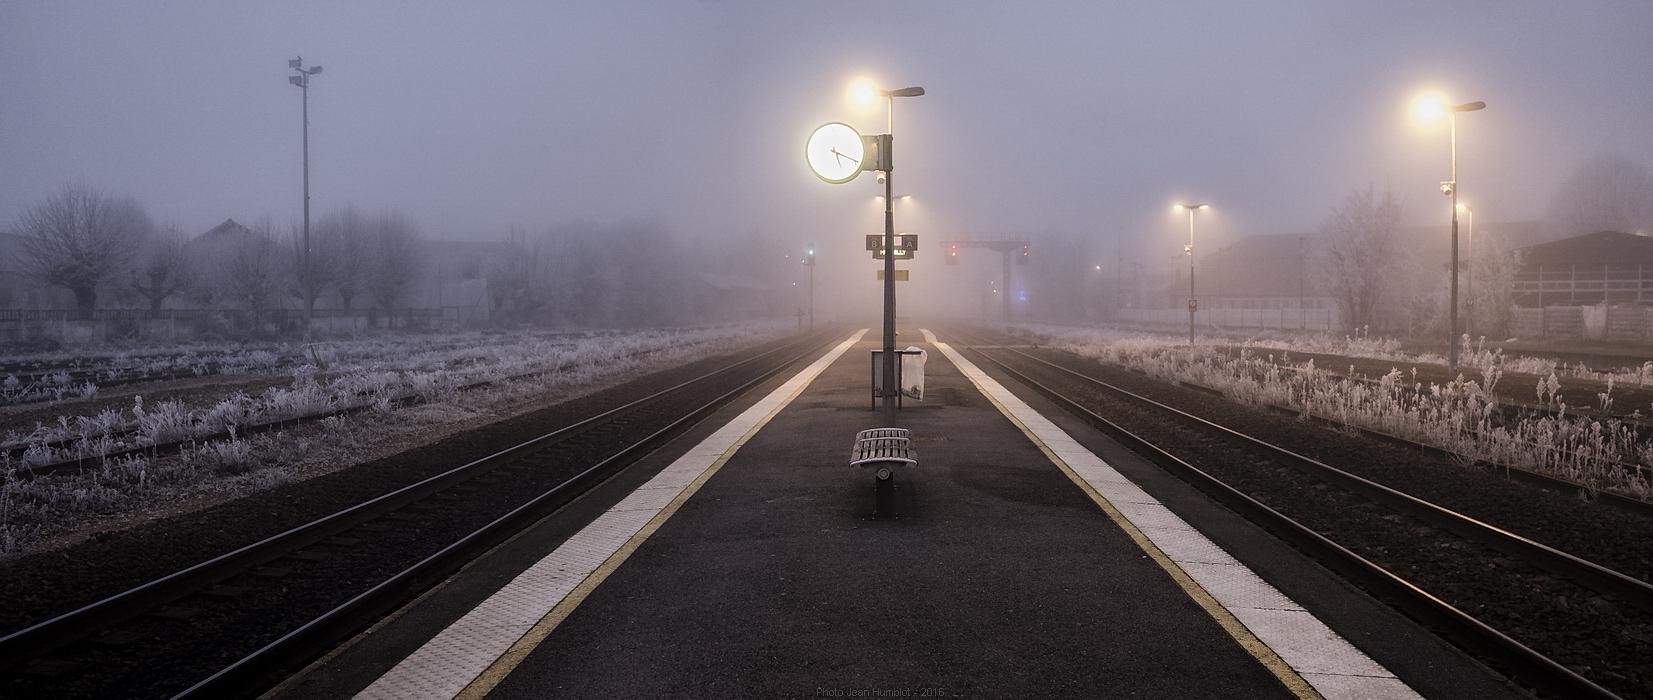 Le train de 17h05 a du retard 17011602252021497014775053